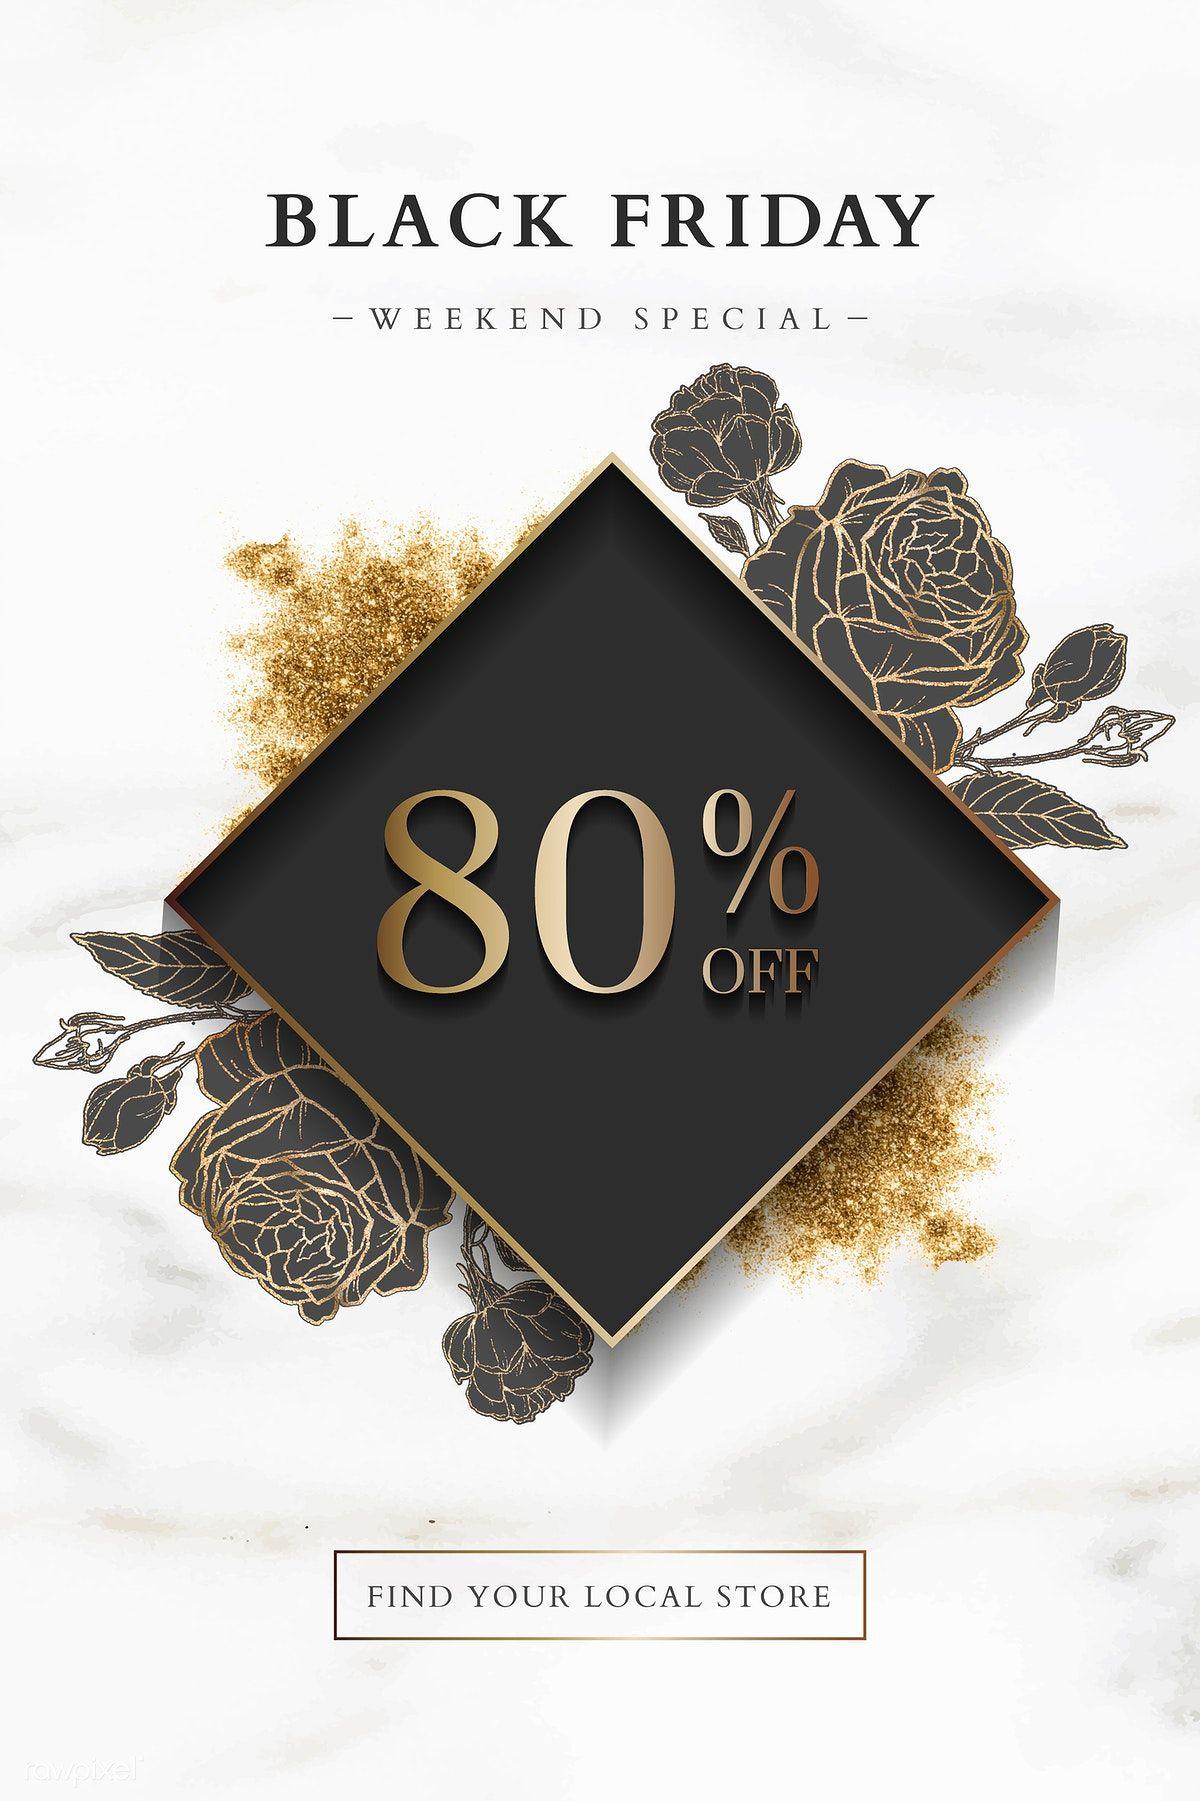 Download Premium Vector Of Black Friday 80 Off Sale Sign On Marble Black Friday Black Friday Design Black Friday Weekend